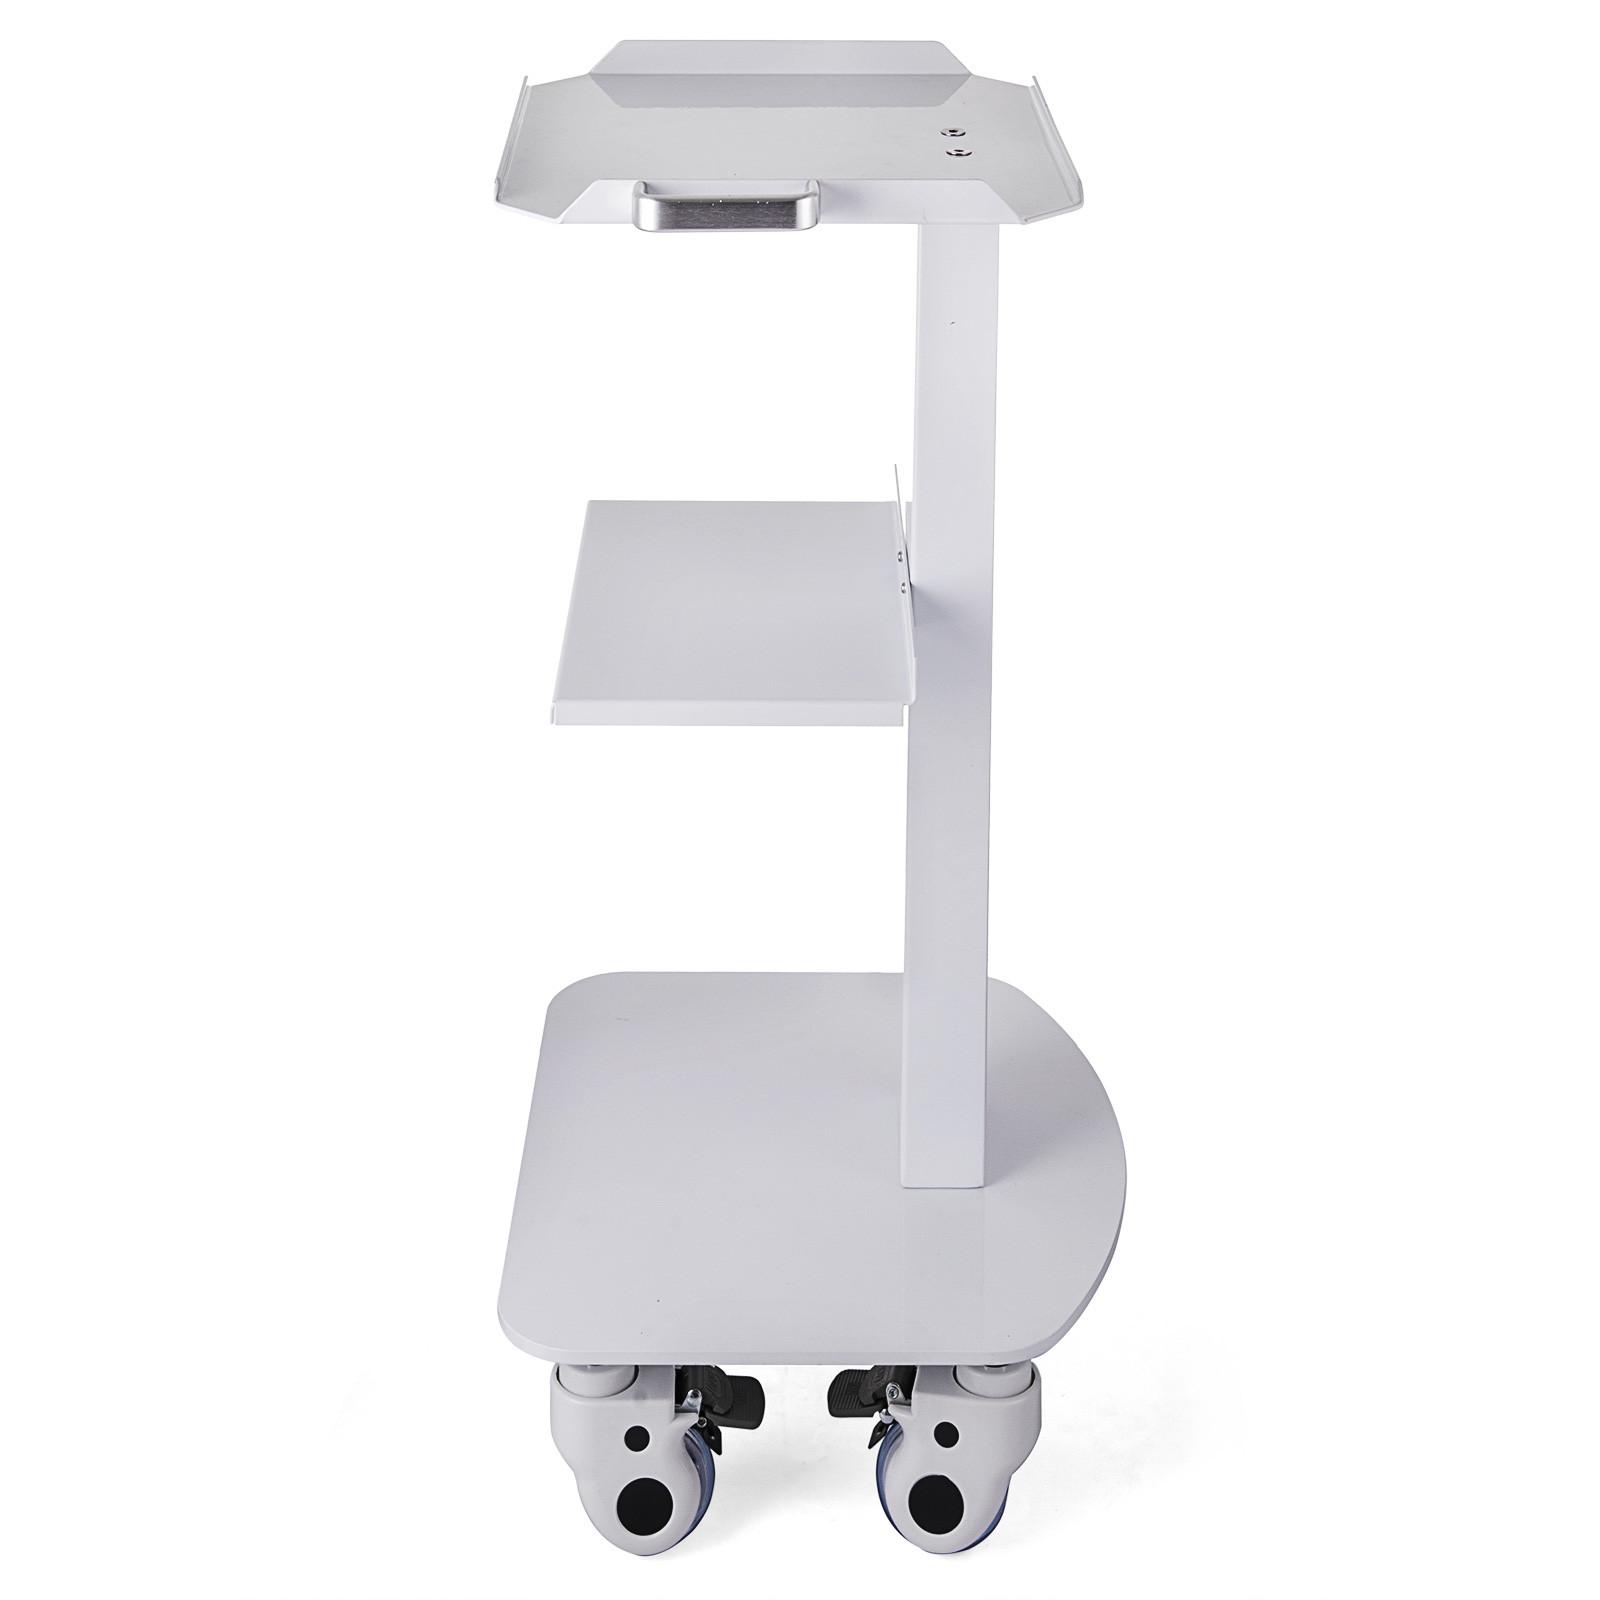 thumbnail 76 - Rolling Storage Cart Medical Salon Trolley Pedestal Rolling Cart Stainless Steel